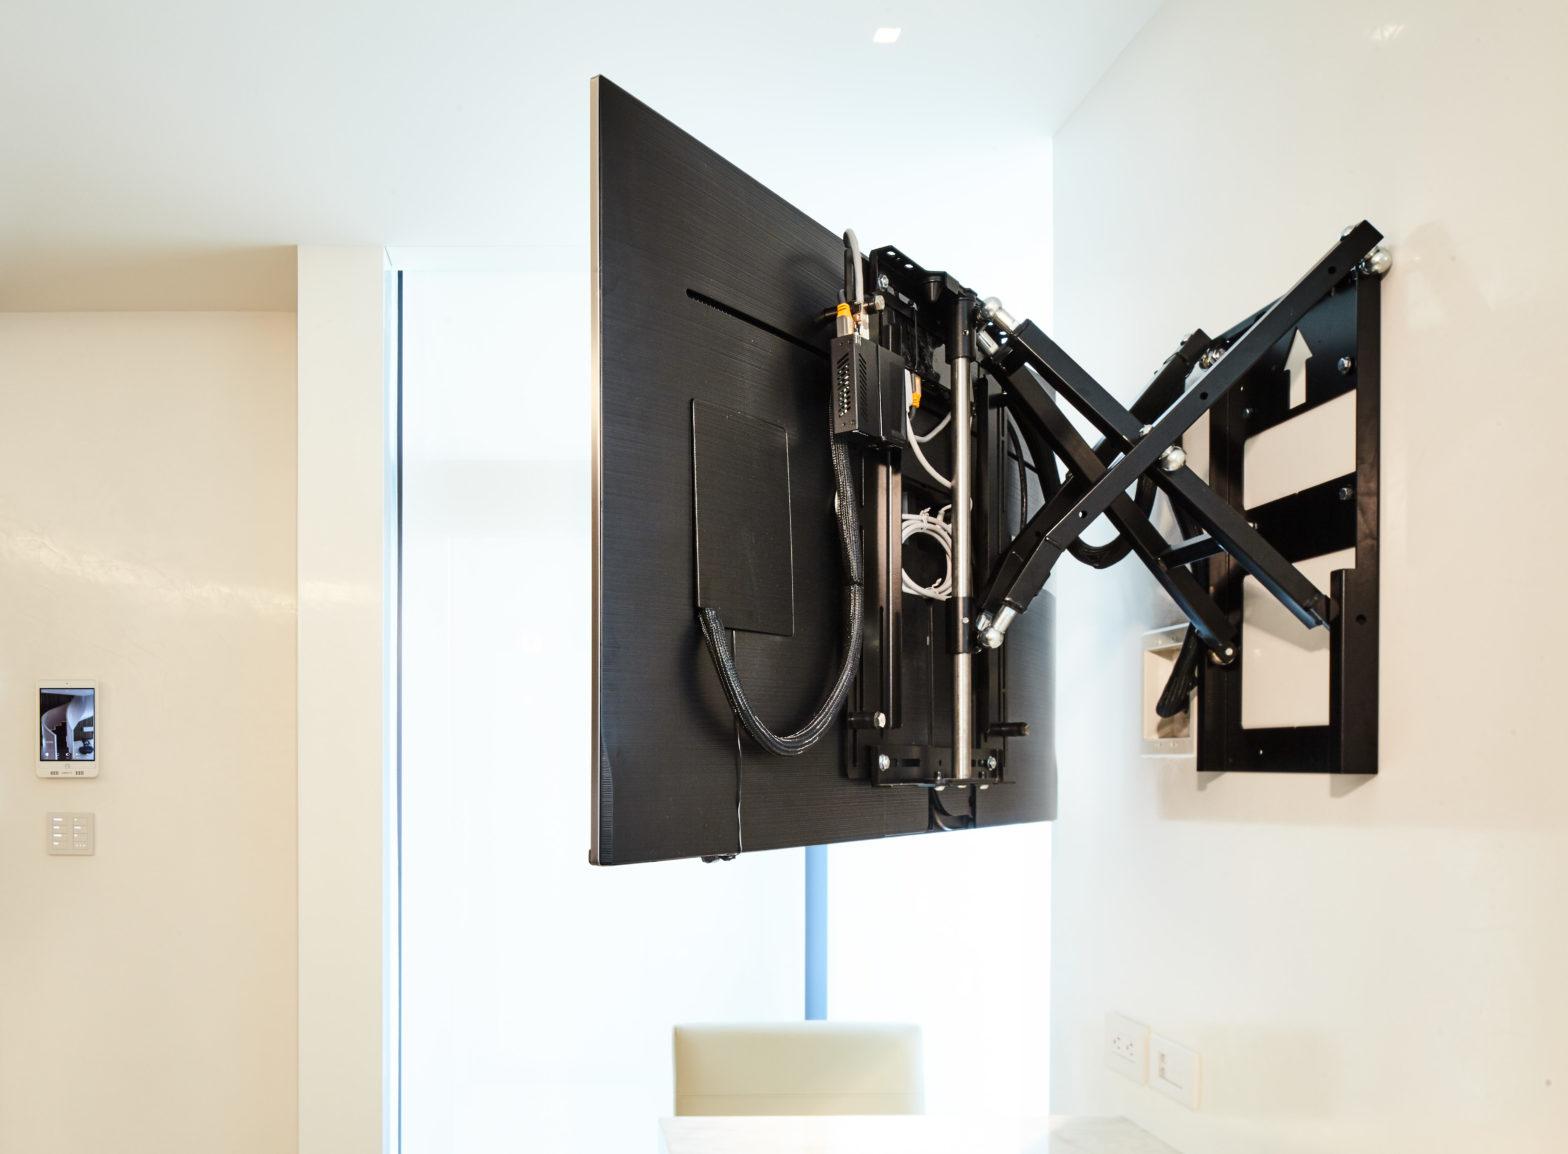 Motorized TV mount